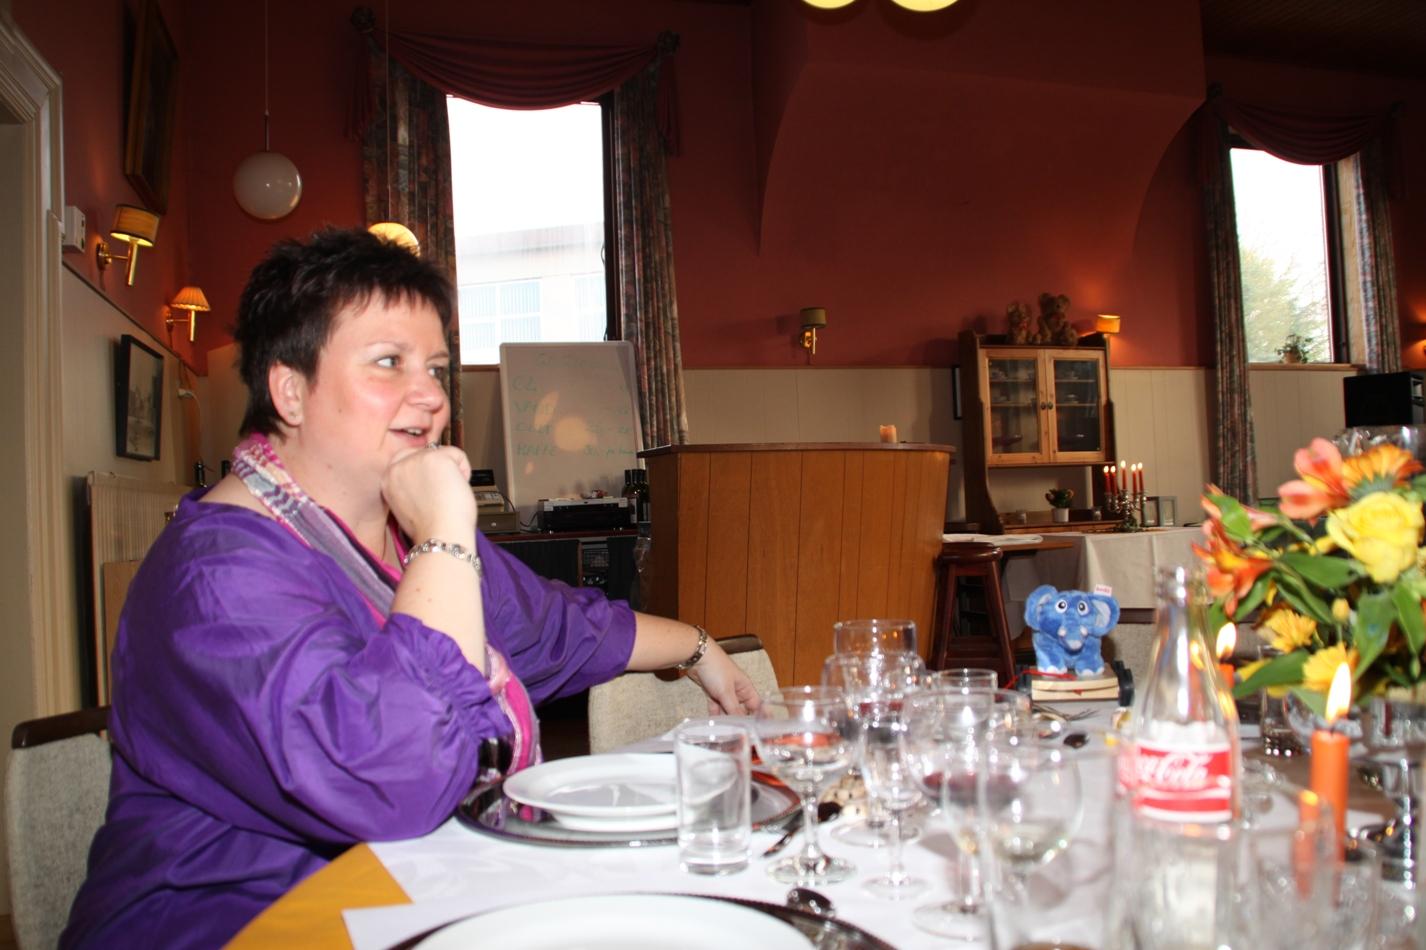 IMG_5155 JØRGEN 75ÅR 08-11-2008 (81)